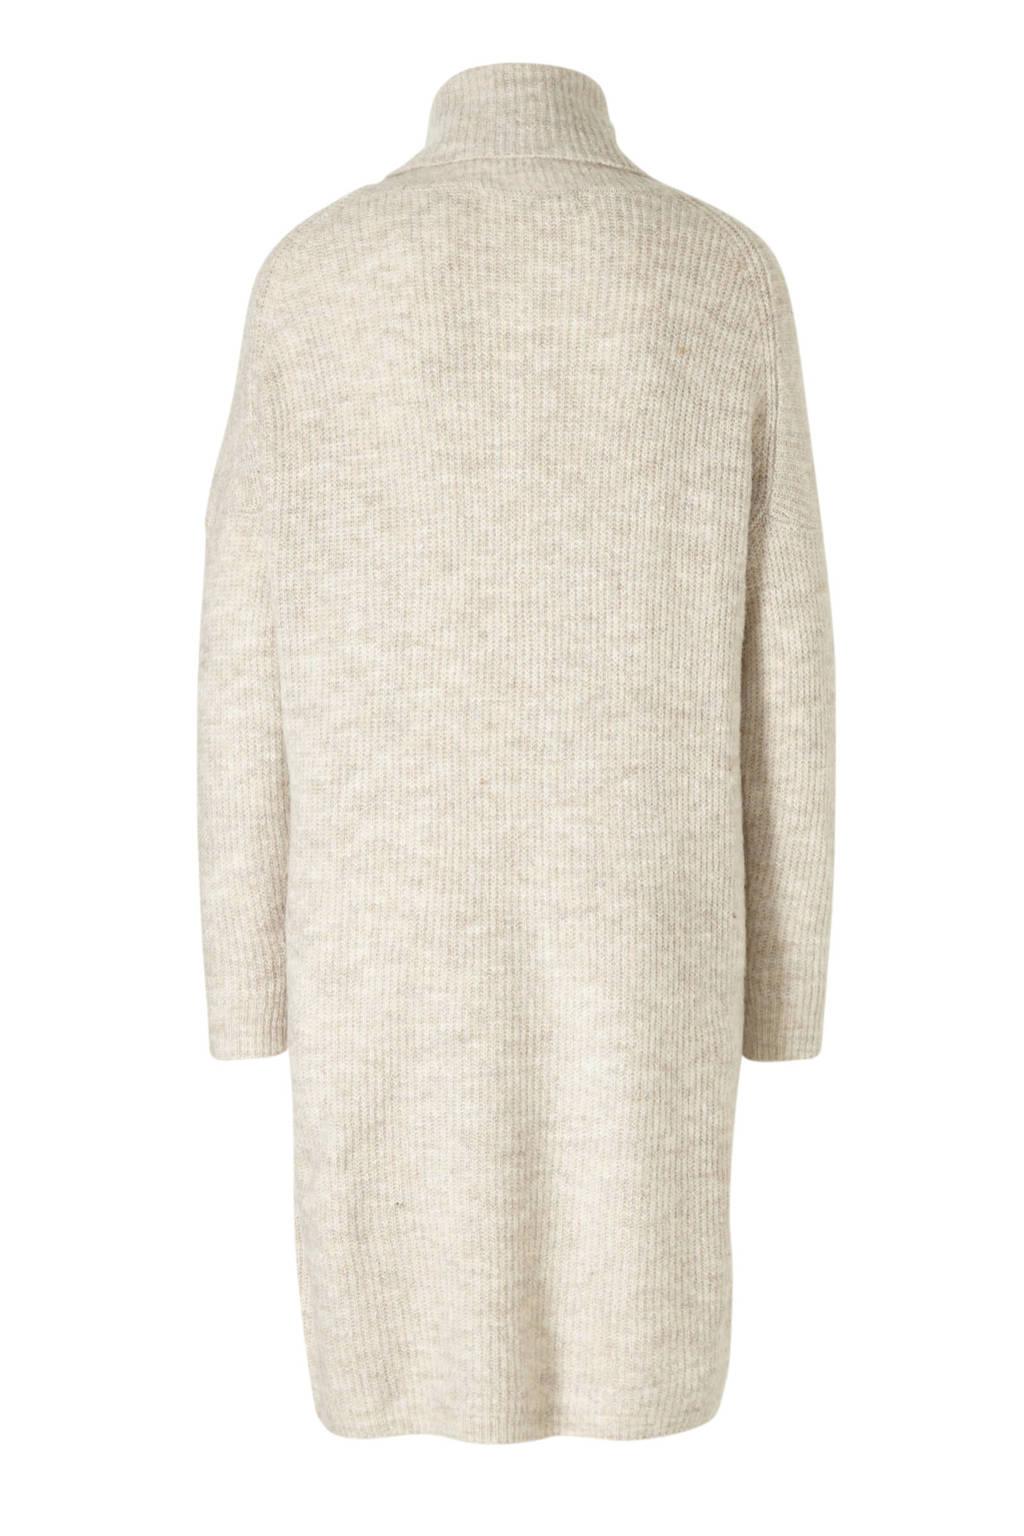 Hedendaags ONLY grofgebreide jurk beige   wehkamp SM-95